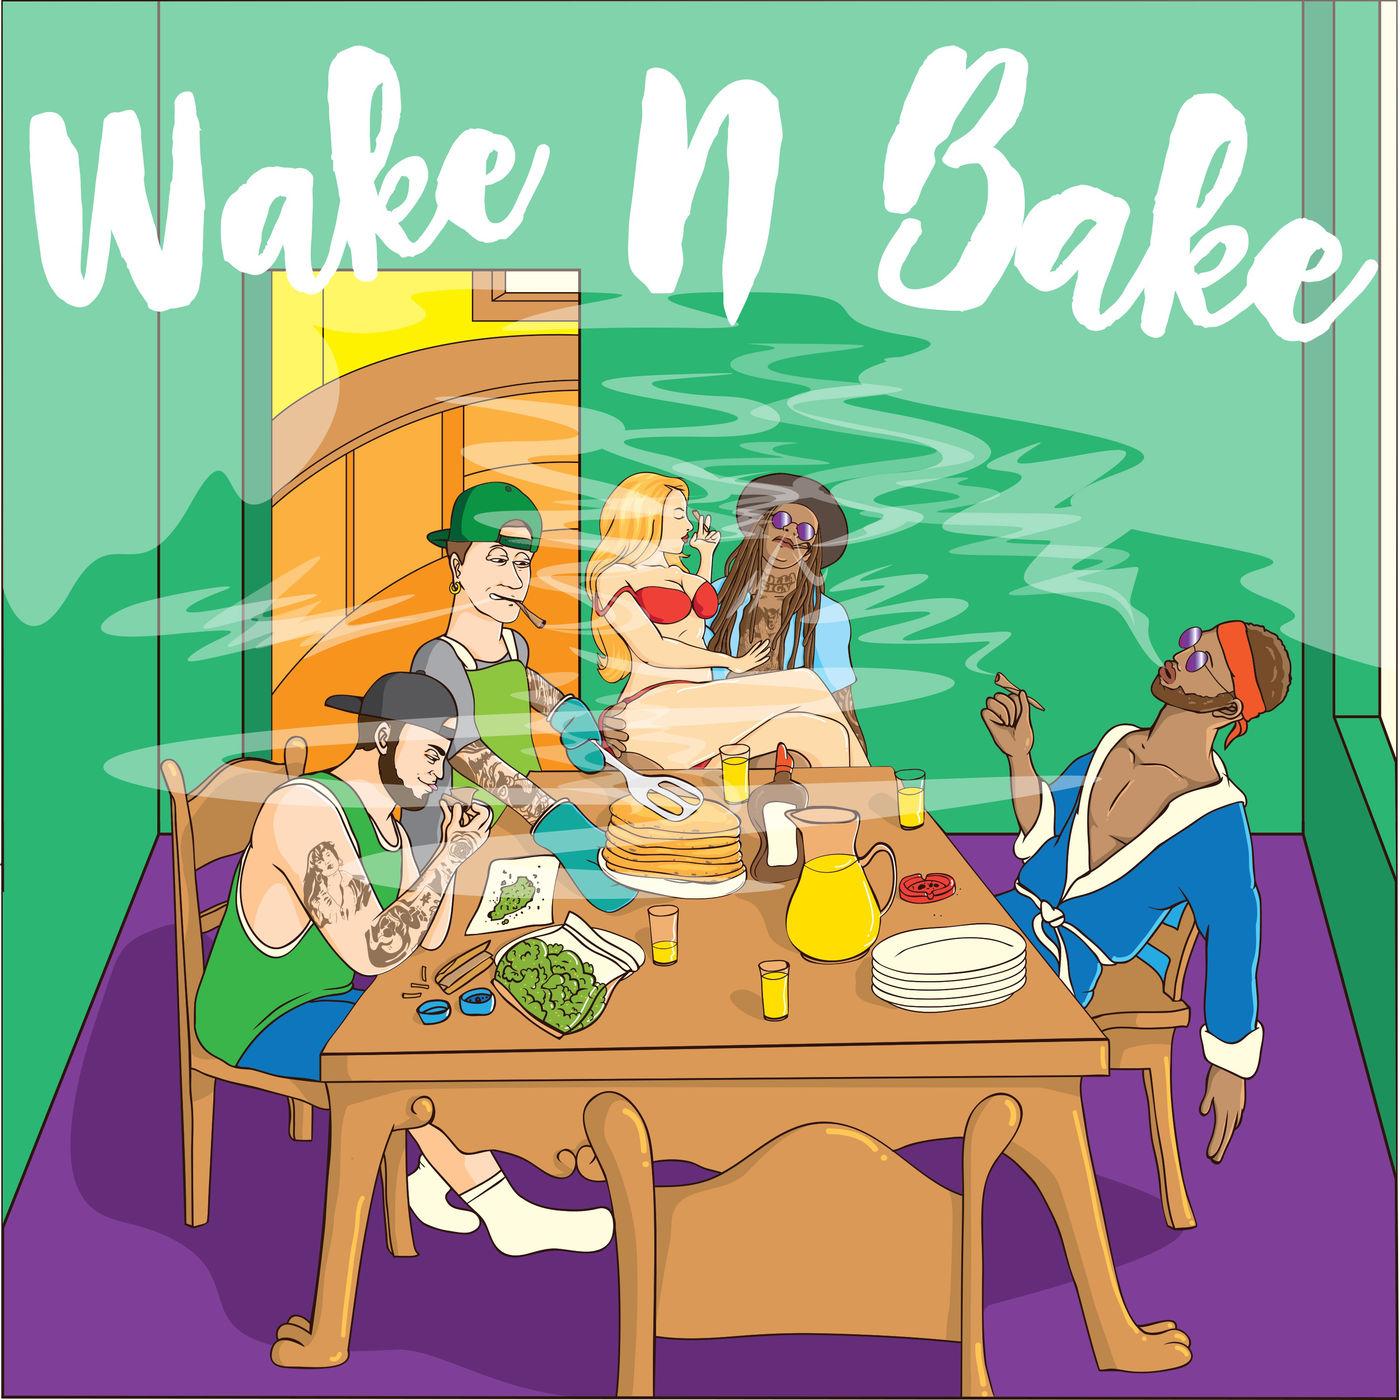 Goodtimes x Garage - Wake n Bake (feat. Ty Dolla $ign, Nathan Palmer, Abe Arnold & Joey Stylez) - Single Cover